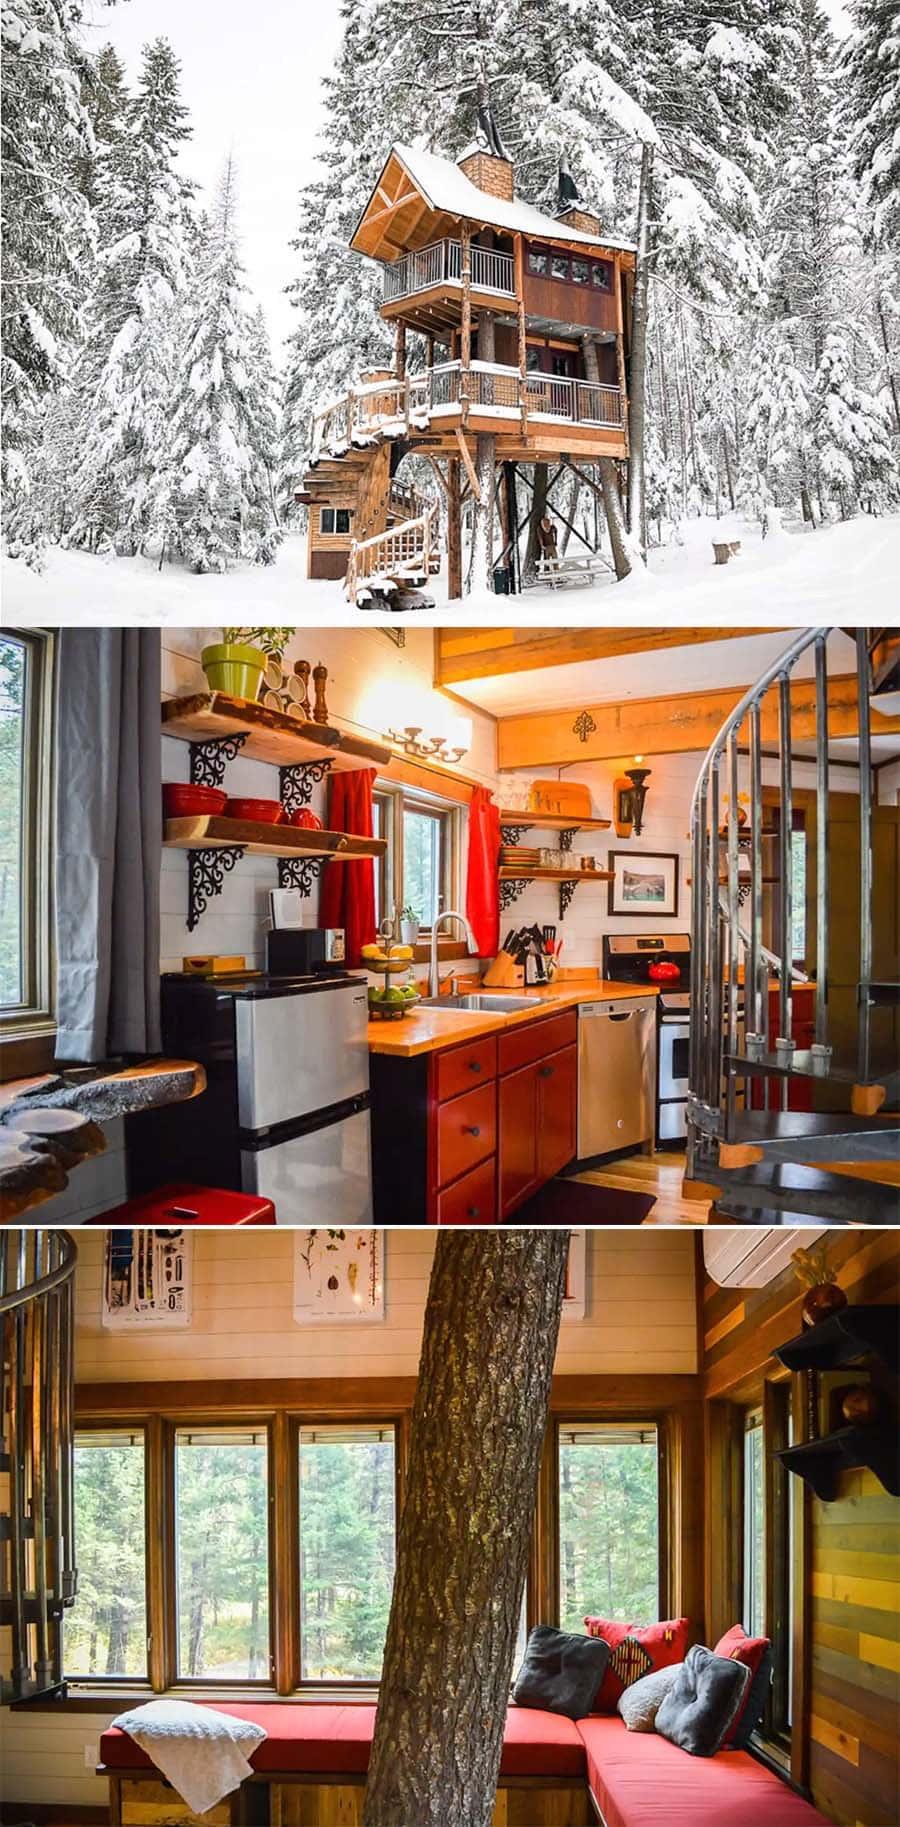 Meadowlark treehouse cabin airbnb